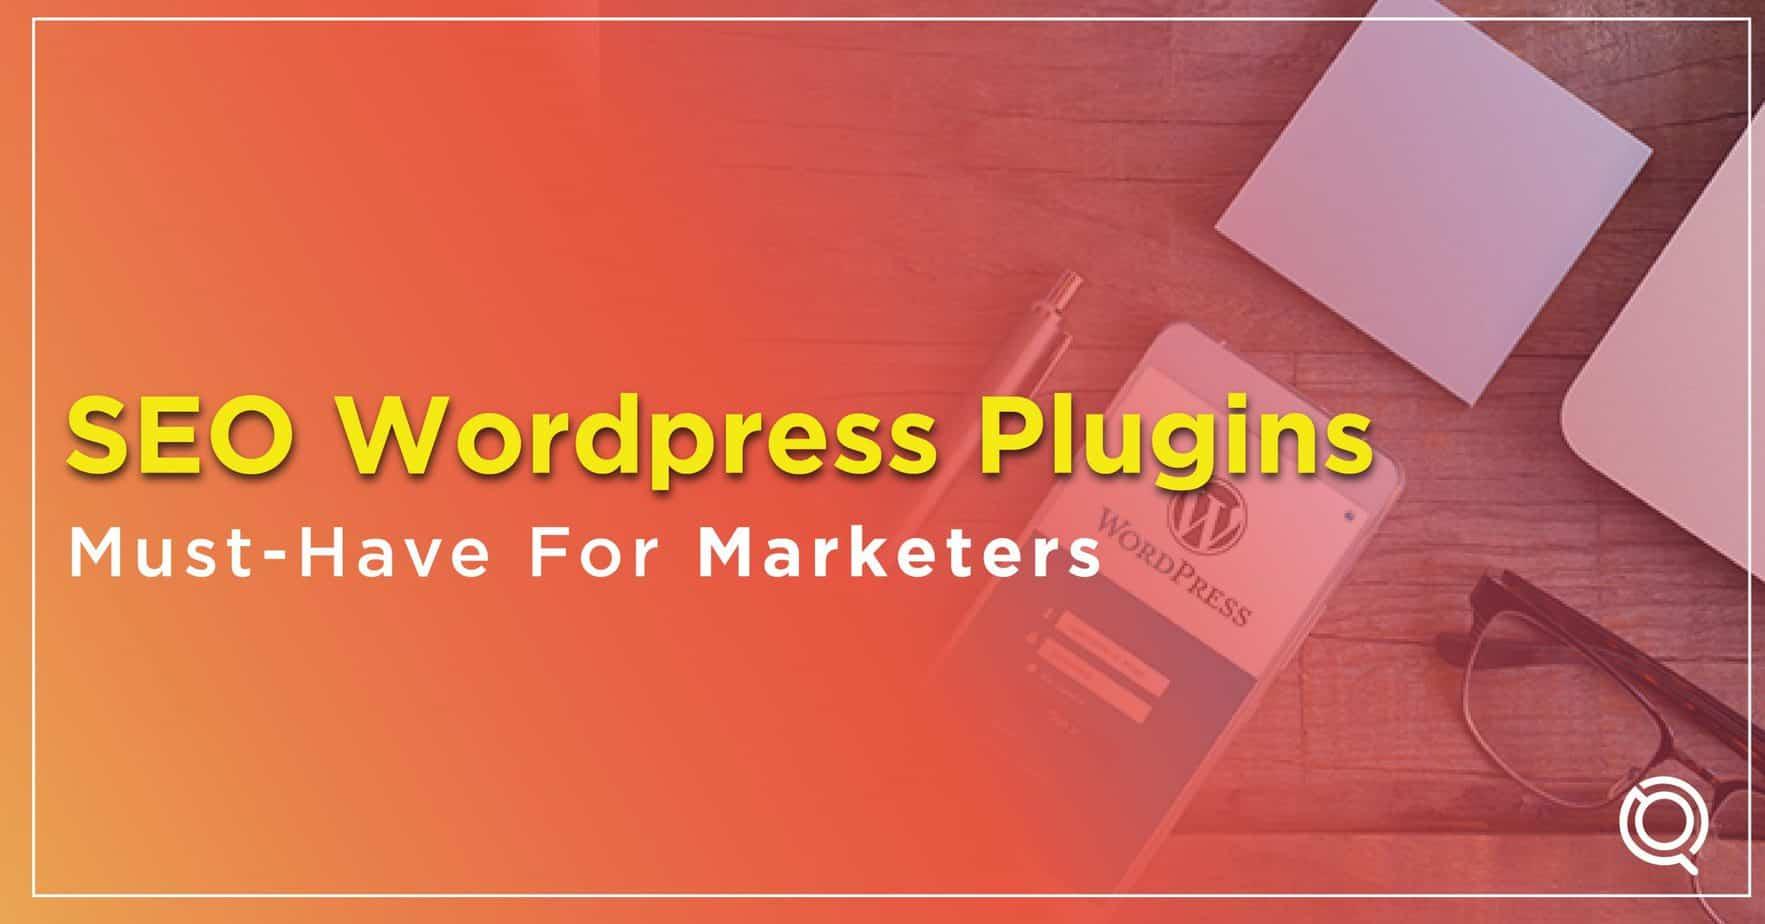 Best SEO WordPress Plugins for Marketers - One Search Pro Digital Marketing Agency